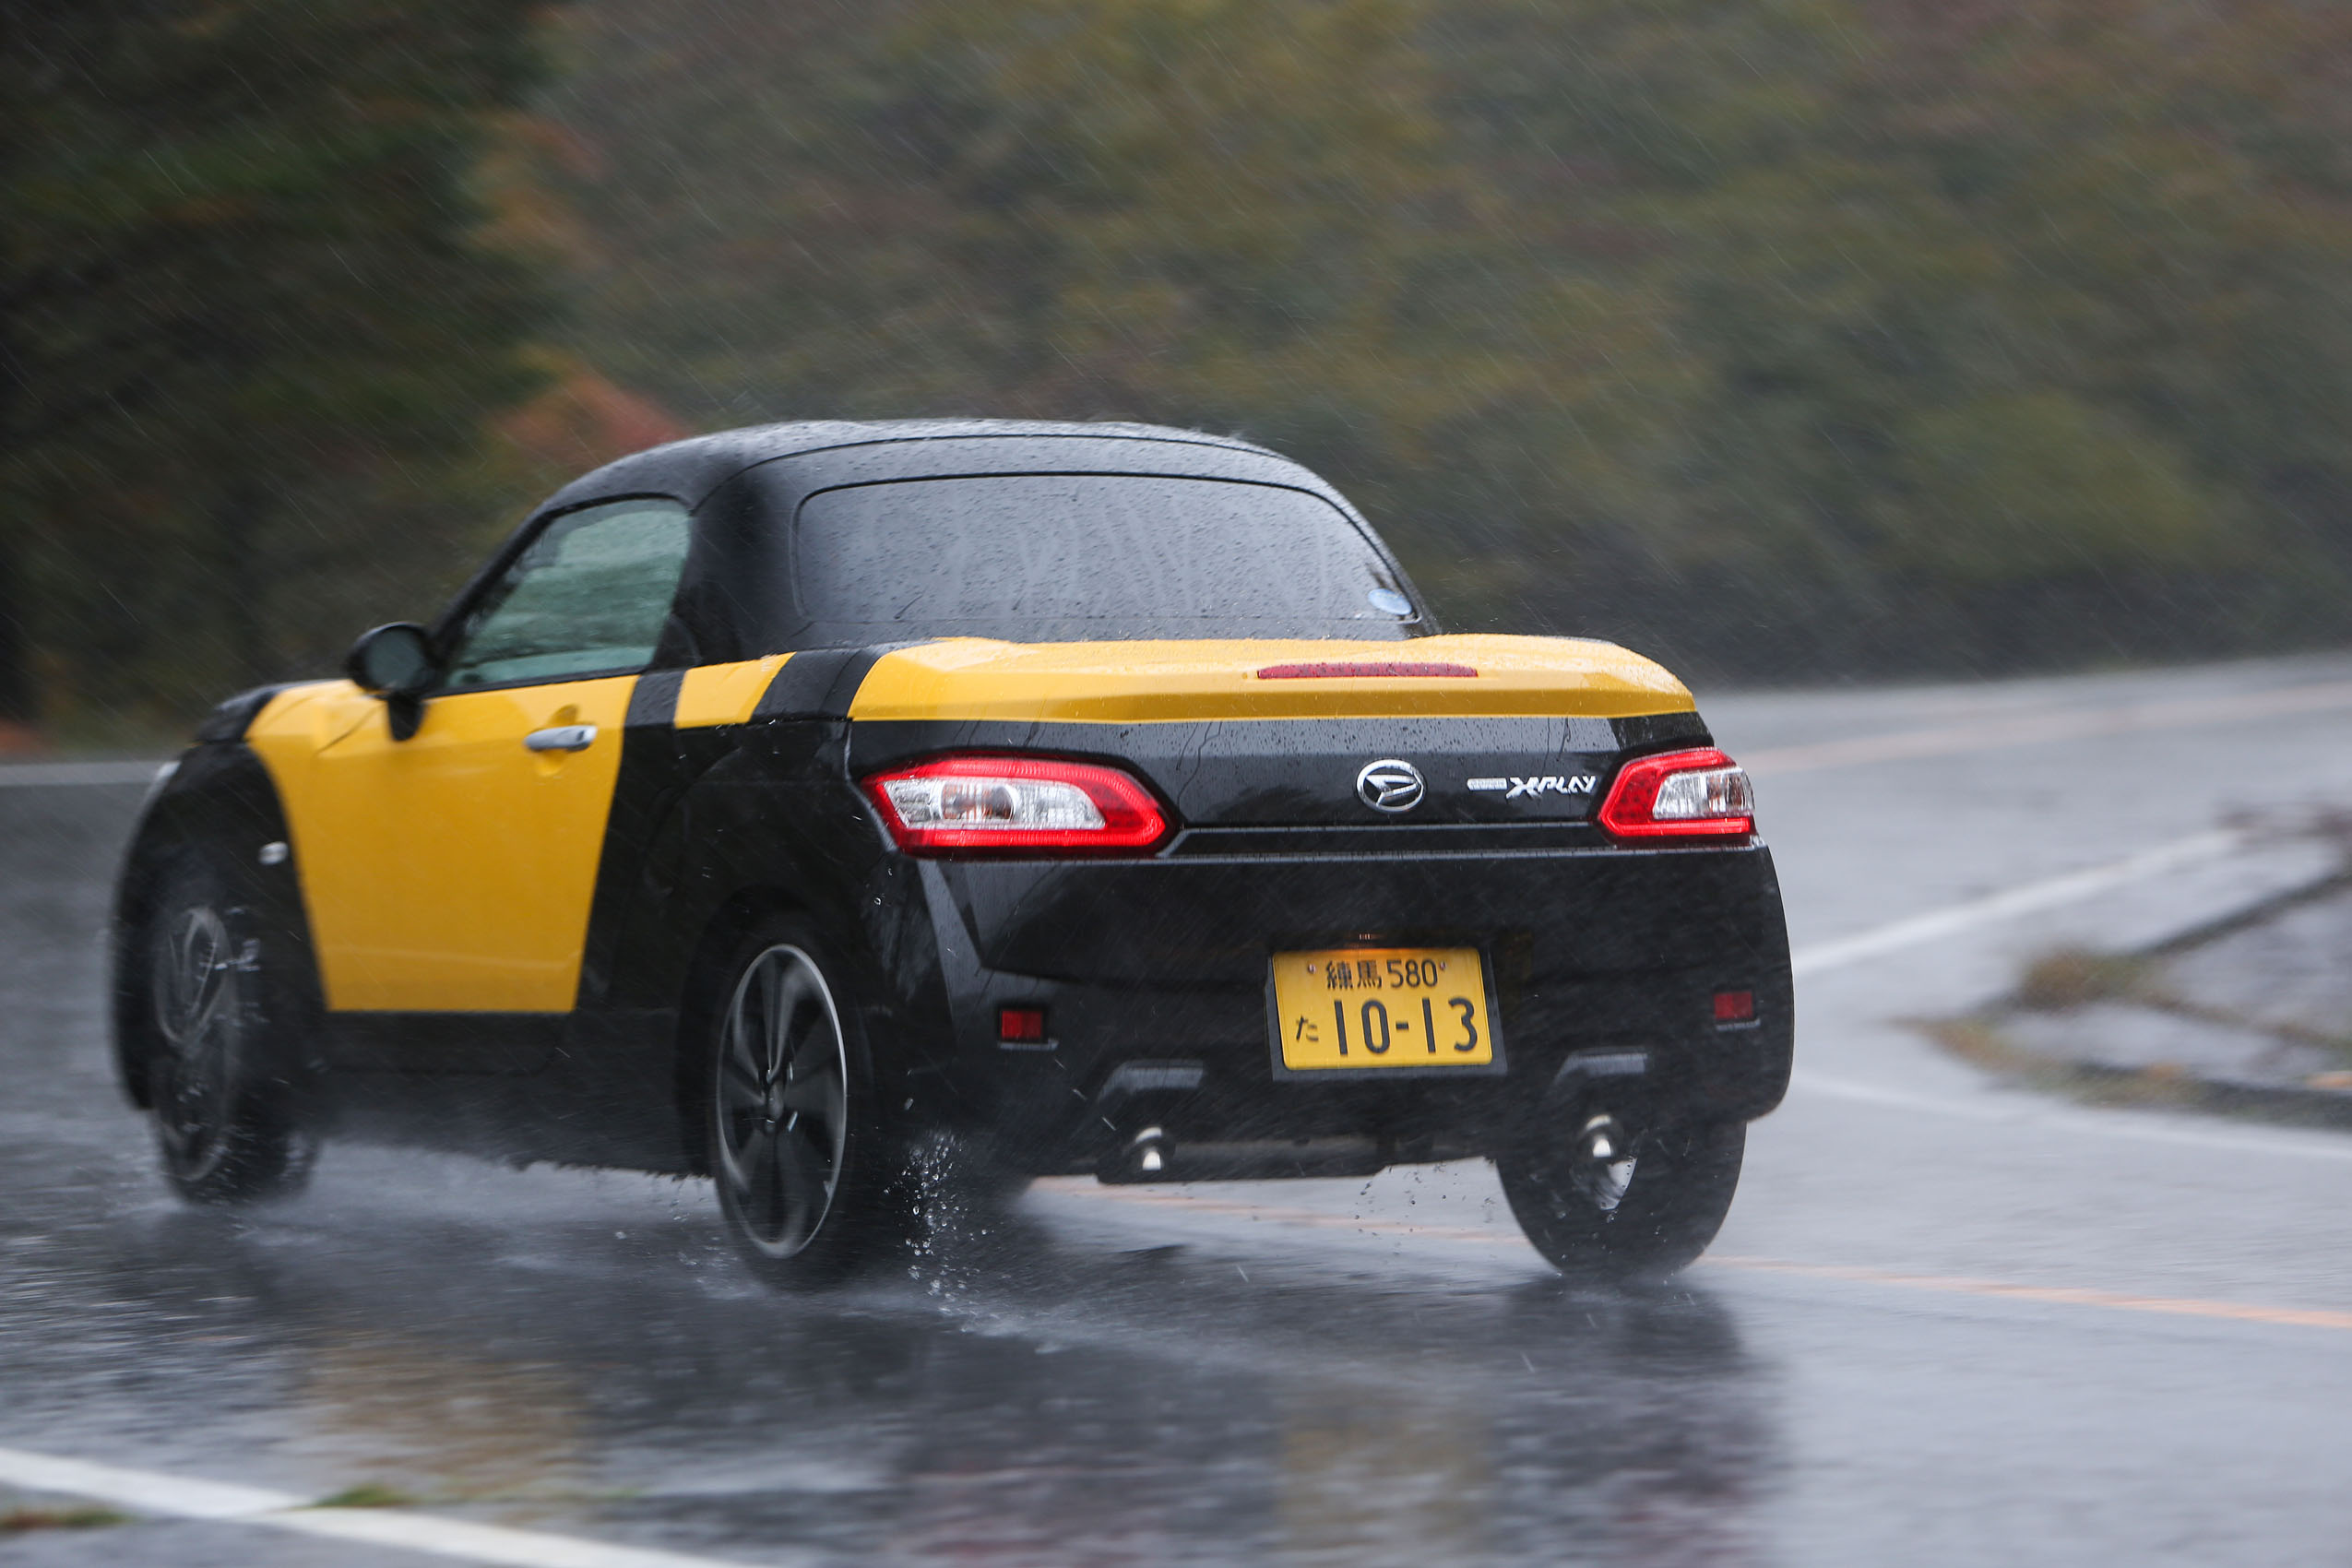 Japans Micro Sports Cars Honda And Daihatsu Kei Cars Driven - Really nice sports cars